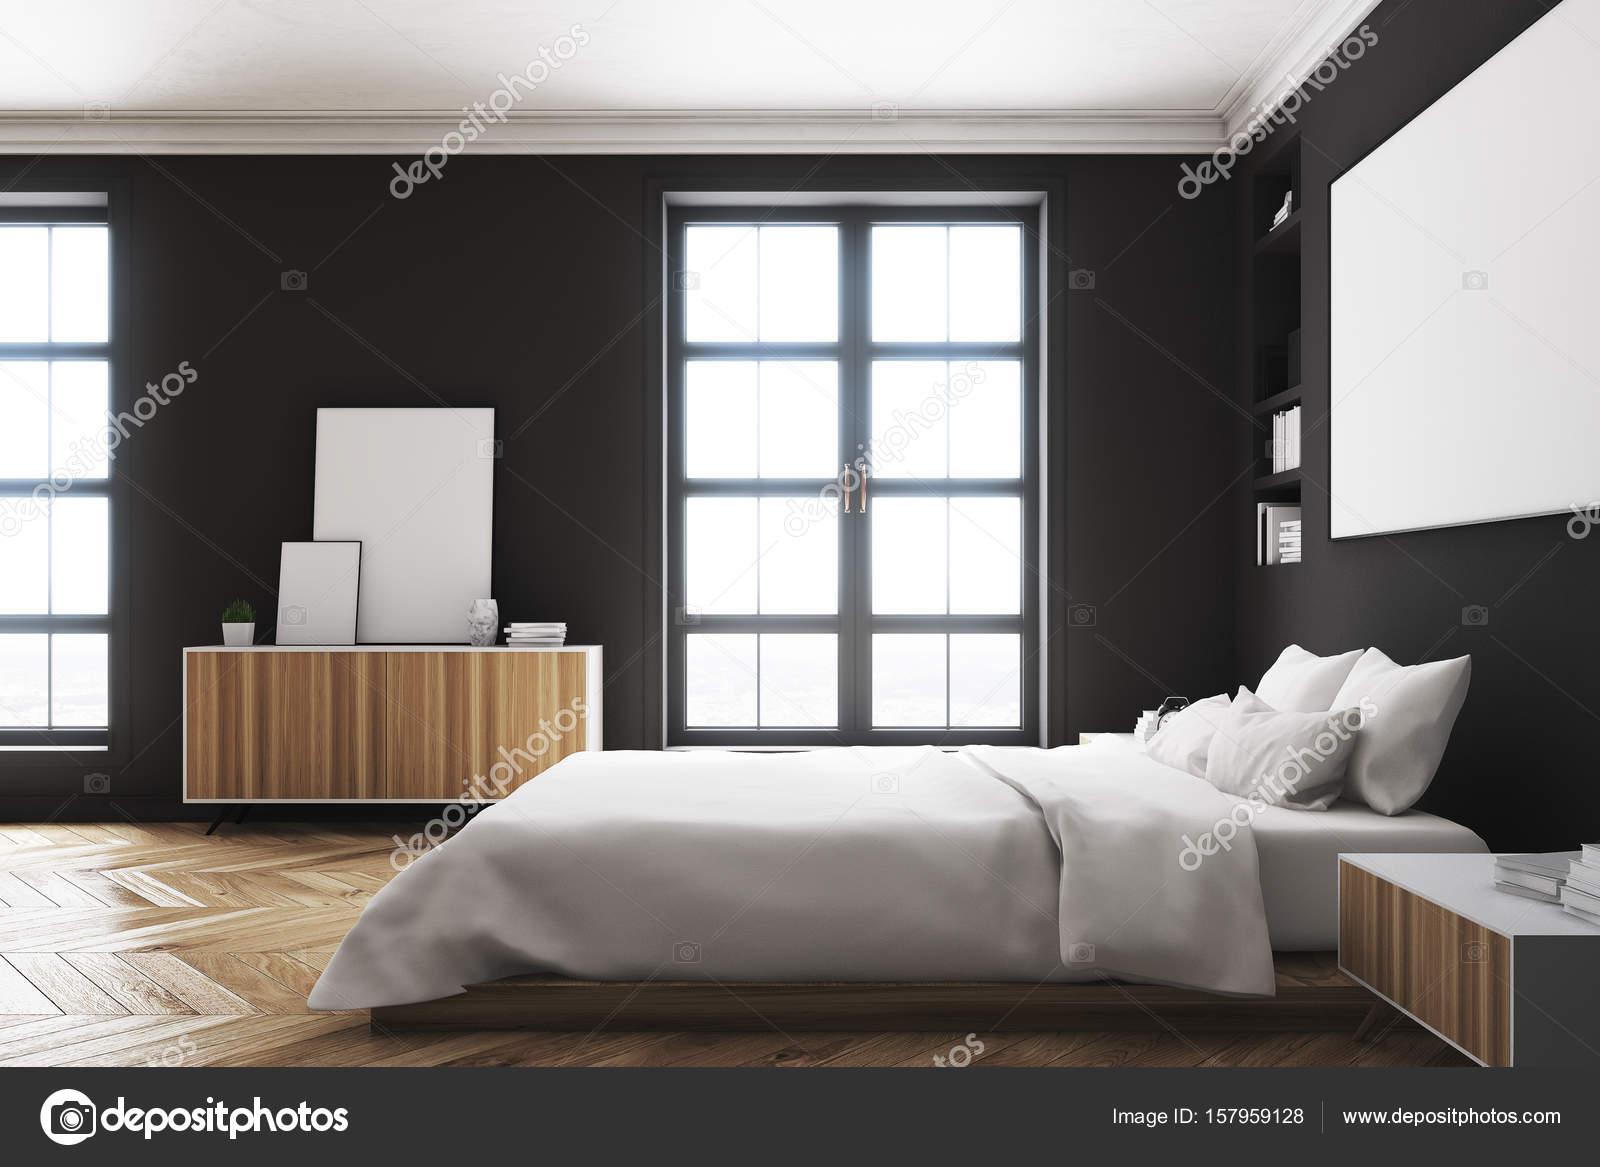 https://st3.depositphotos.com/2673929/15795/i/1600/depositphotos_157959128-stockafbeelding-slaapkamer-interieur-poster-kant-zwart.jpg